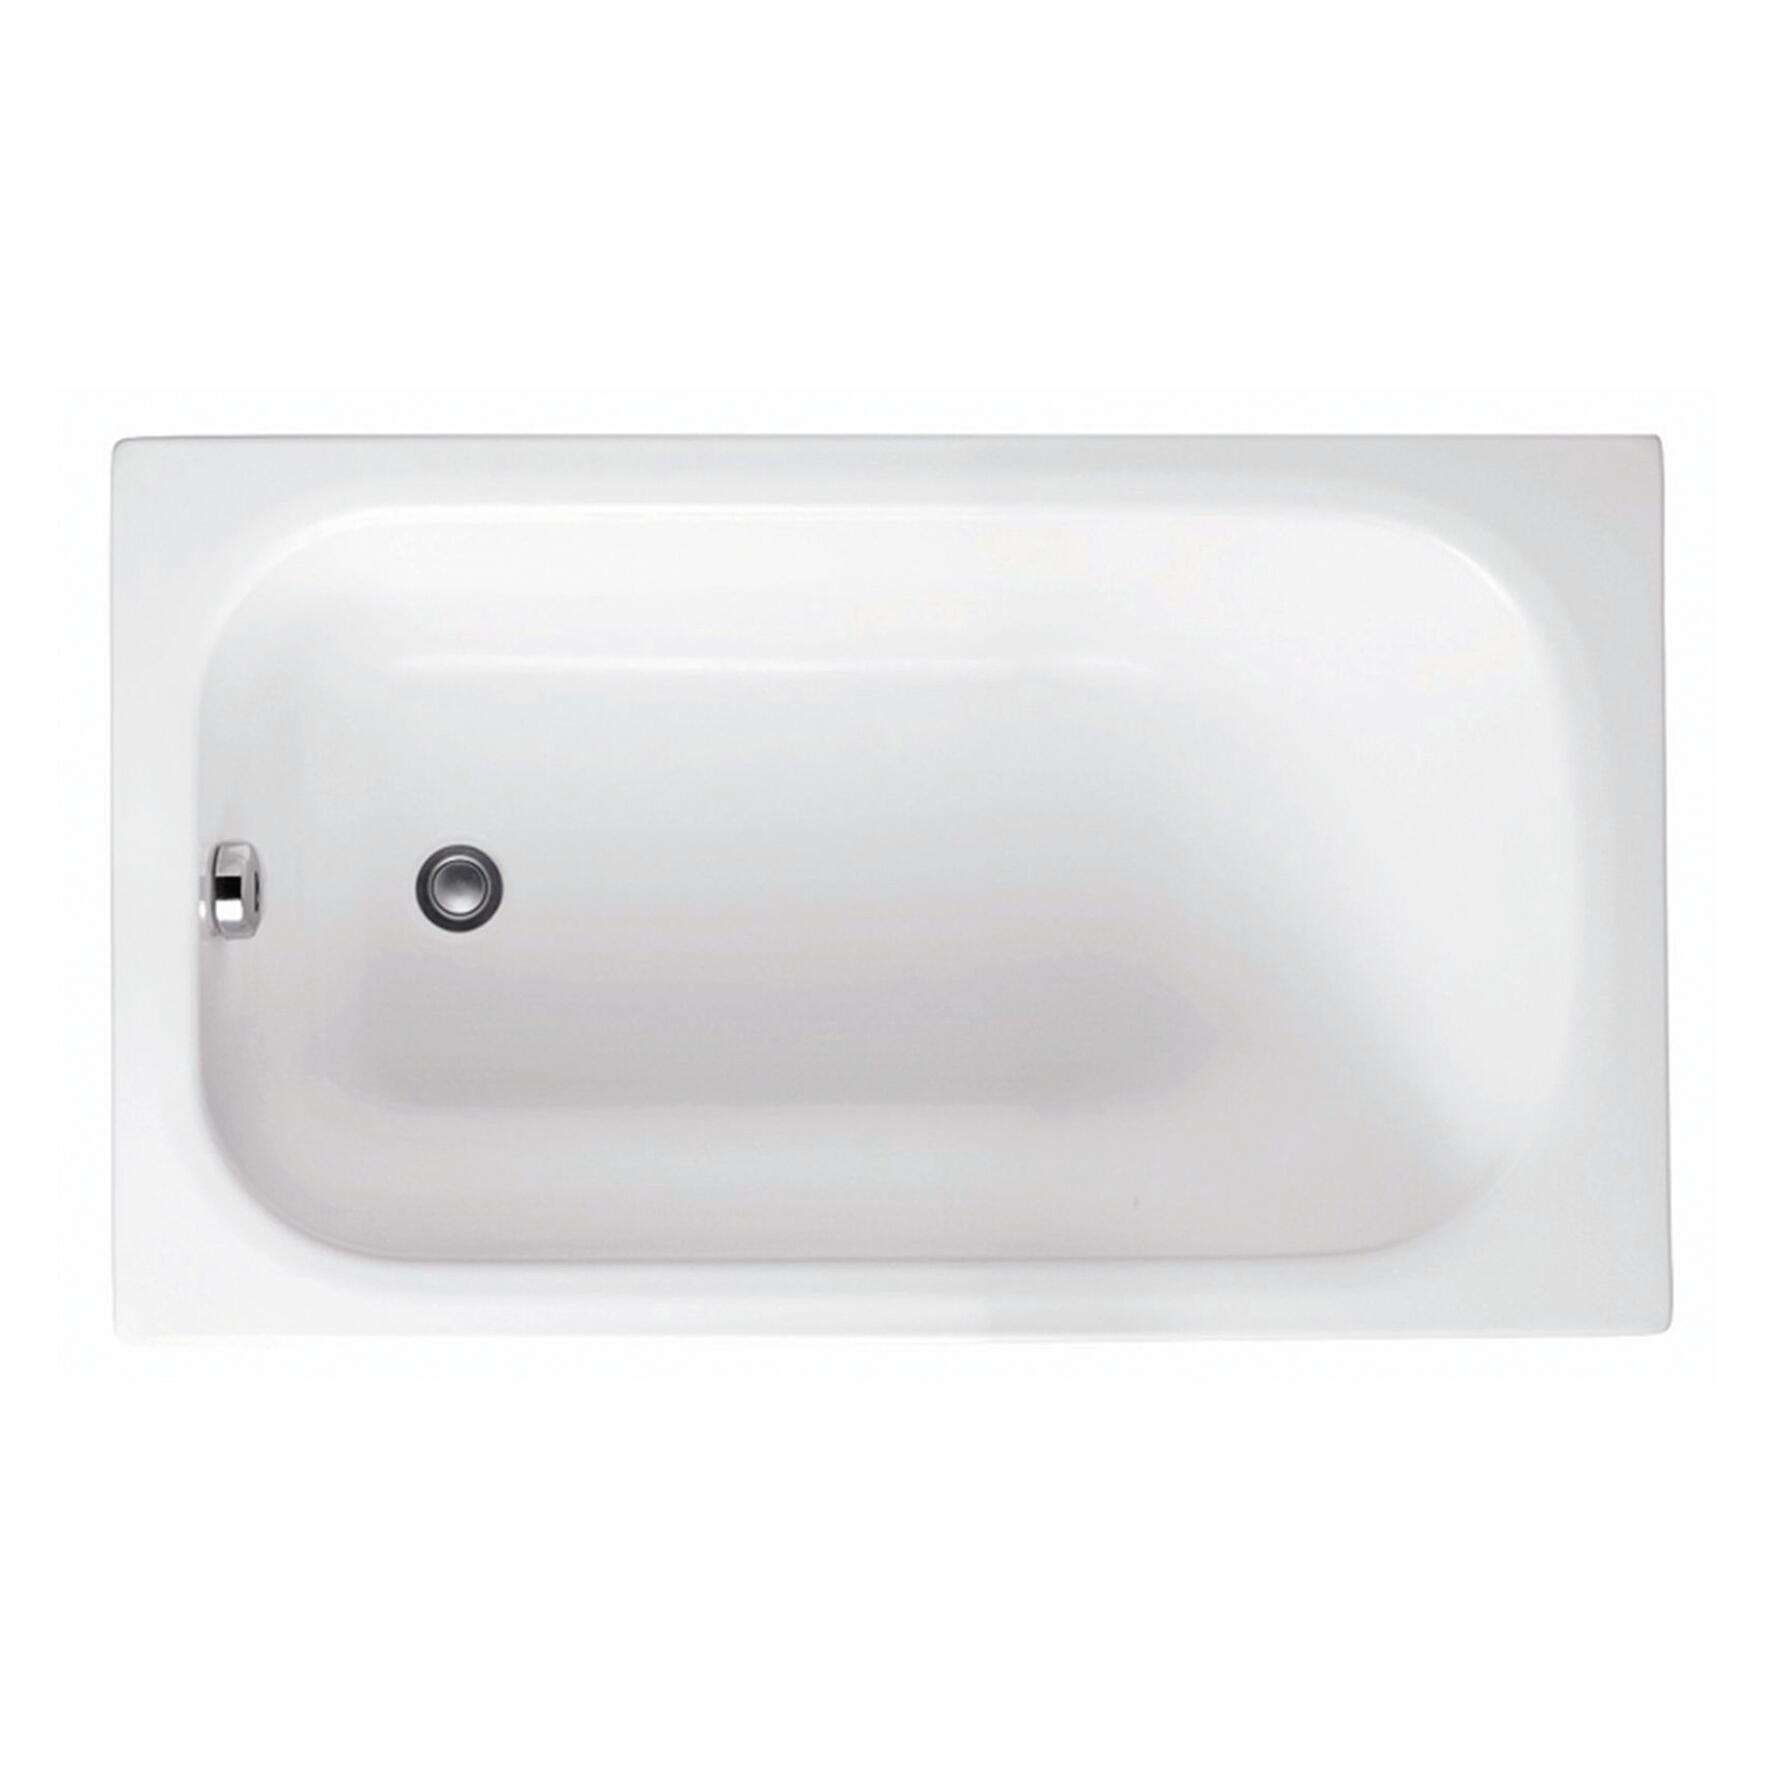 Vasca Rettangolare Mini Bianco 70 X 120 Cm Leroy Merlin